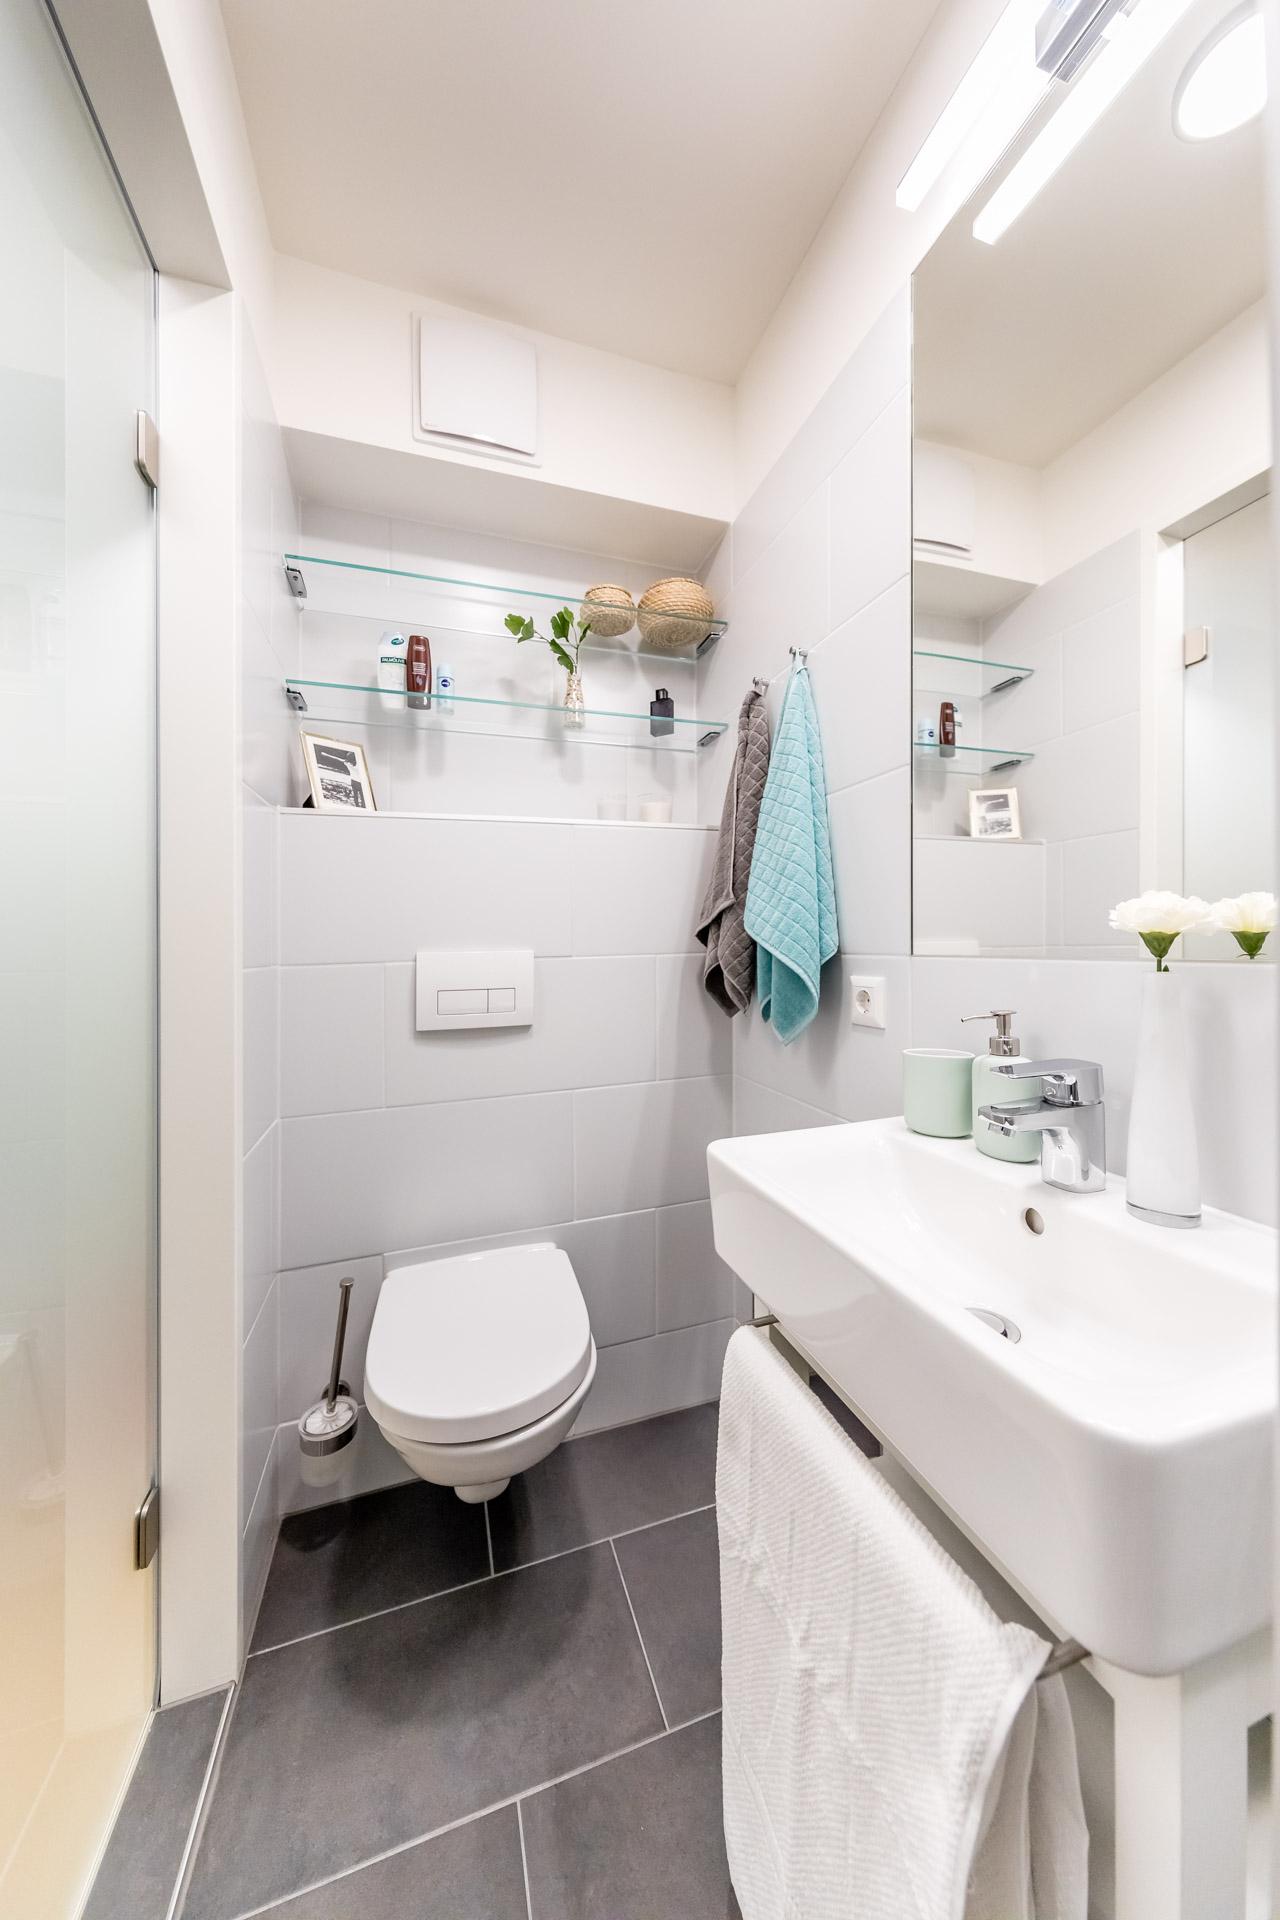 THE FIZZ Double Apartment - Badezimmer